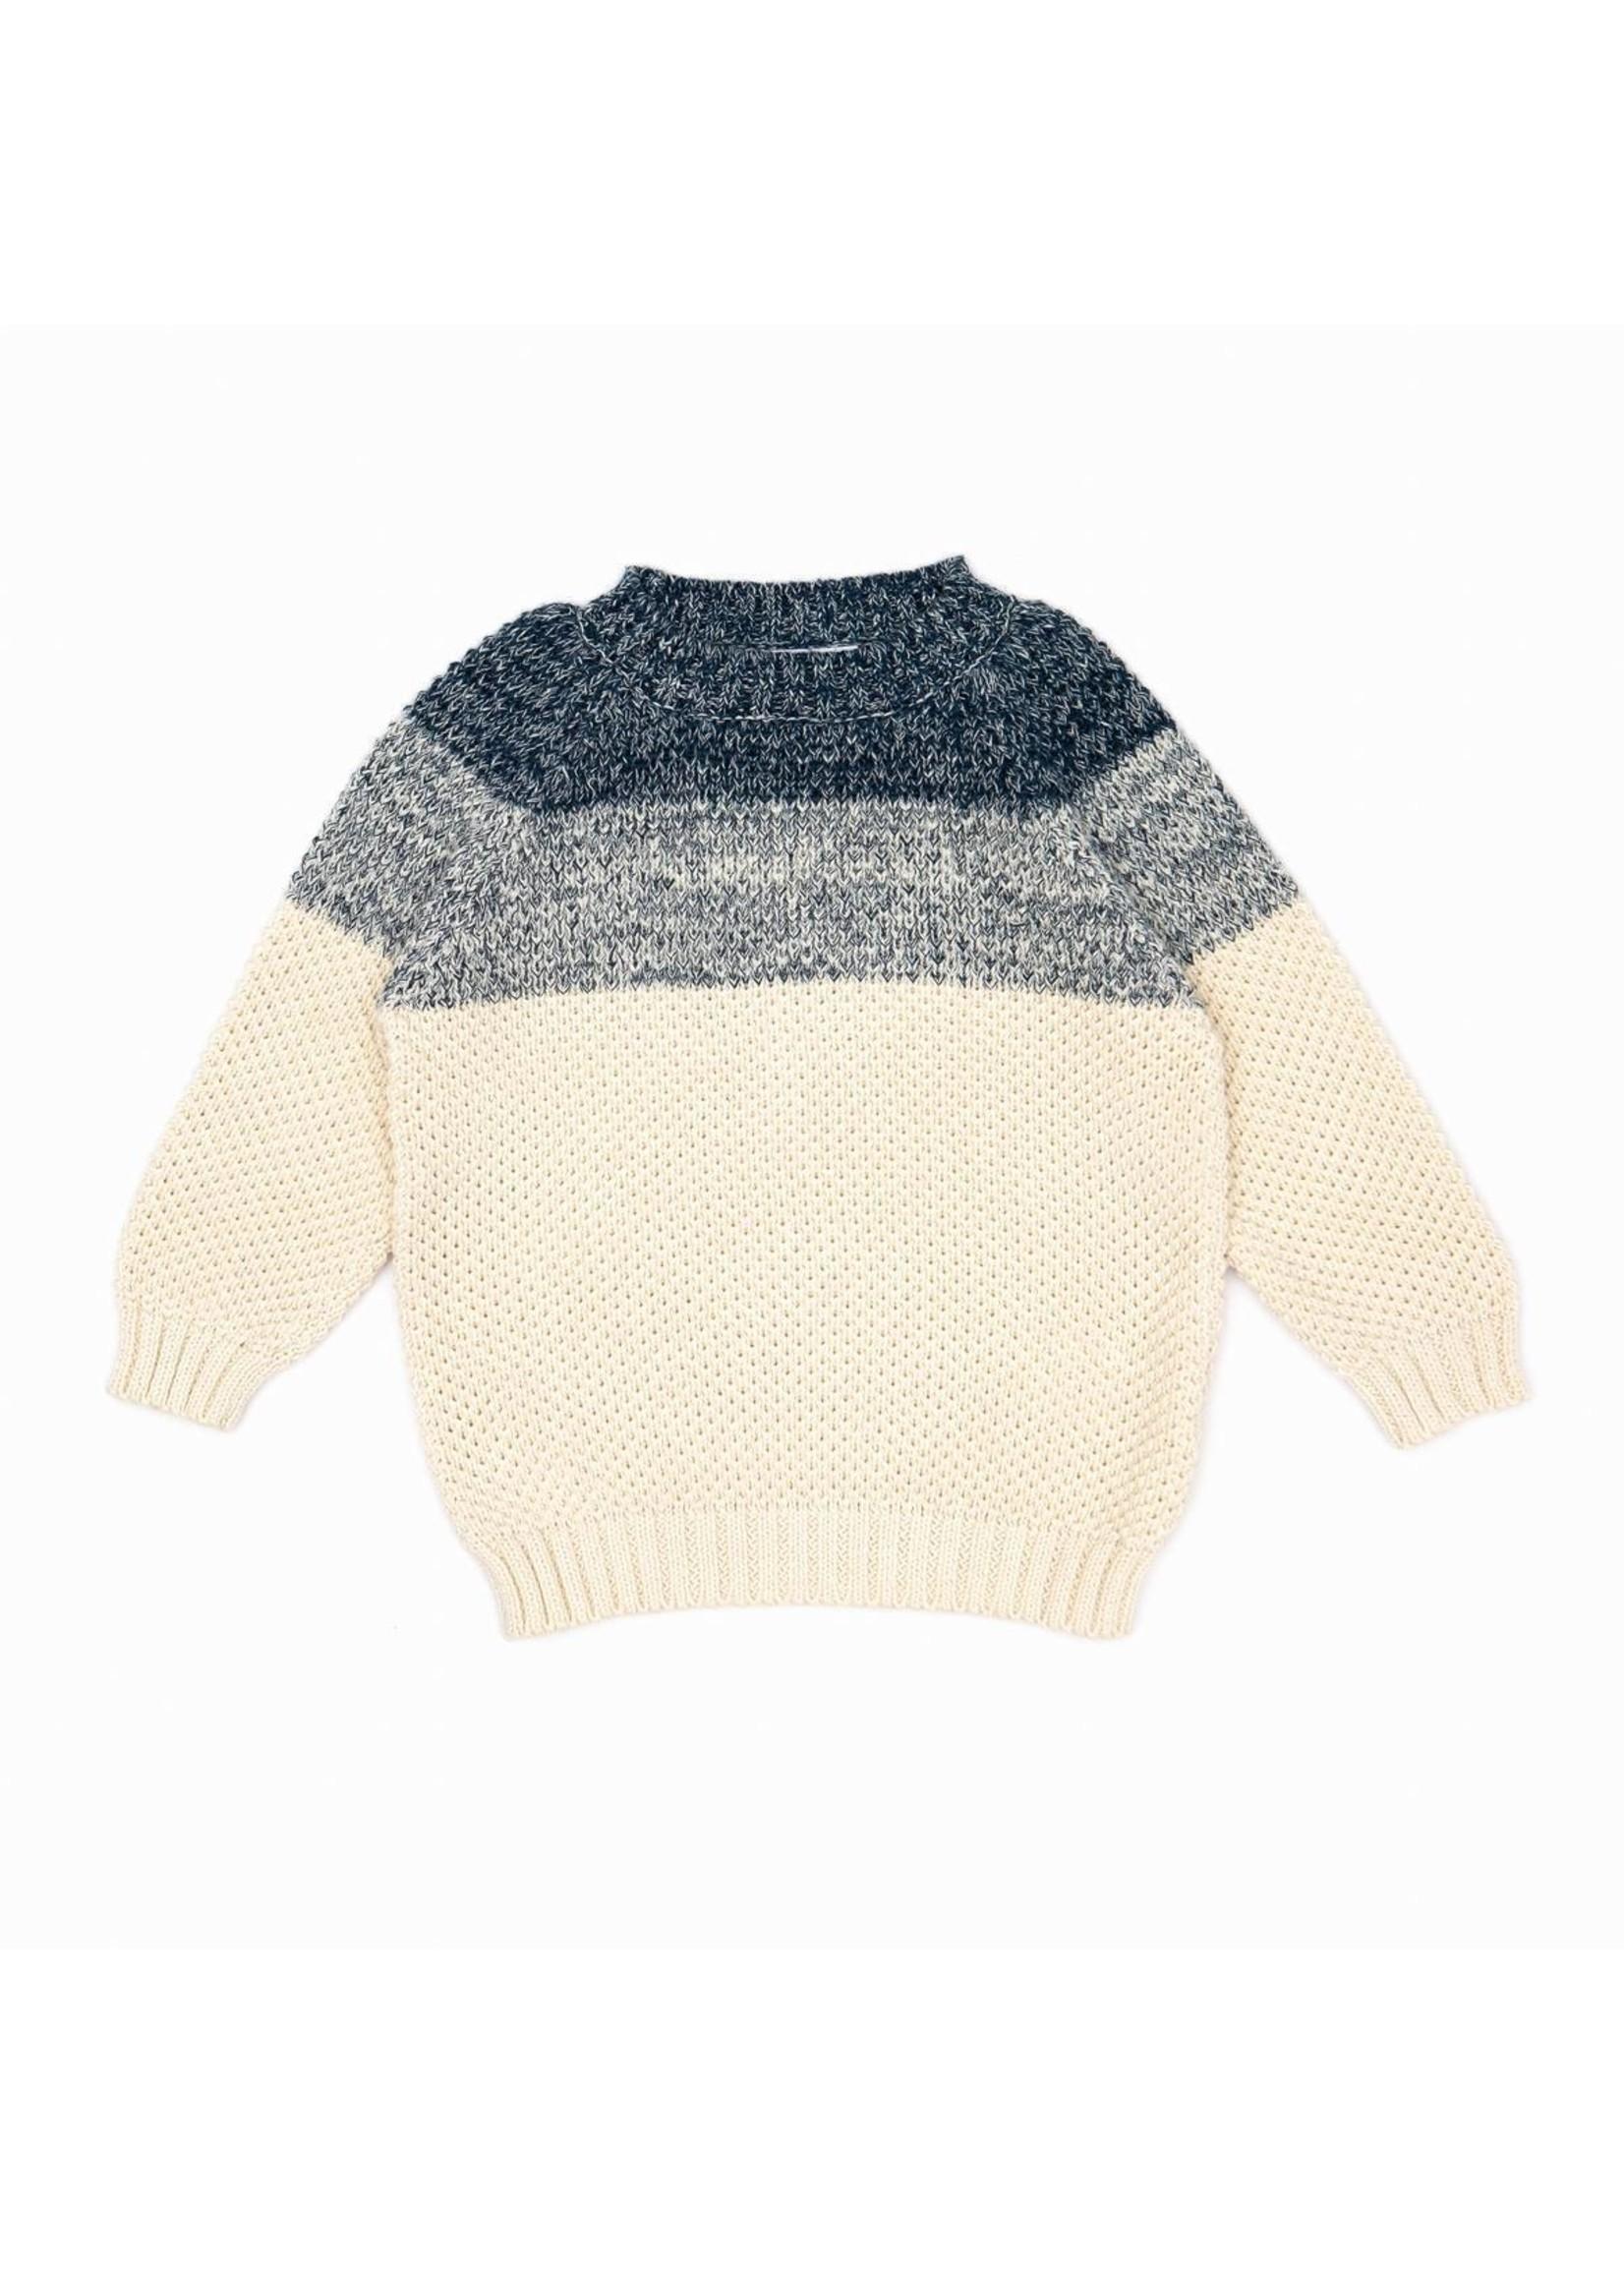 Tun Tun Tun Tun Navy Marl and Natural Lucas Sweater